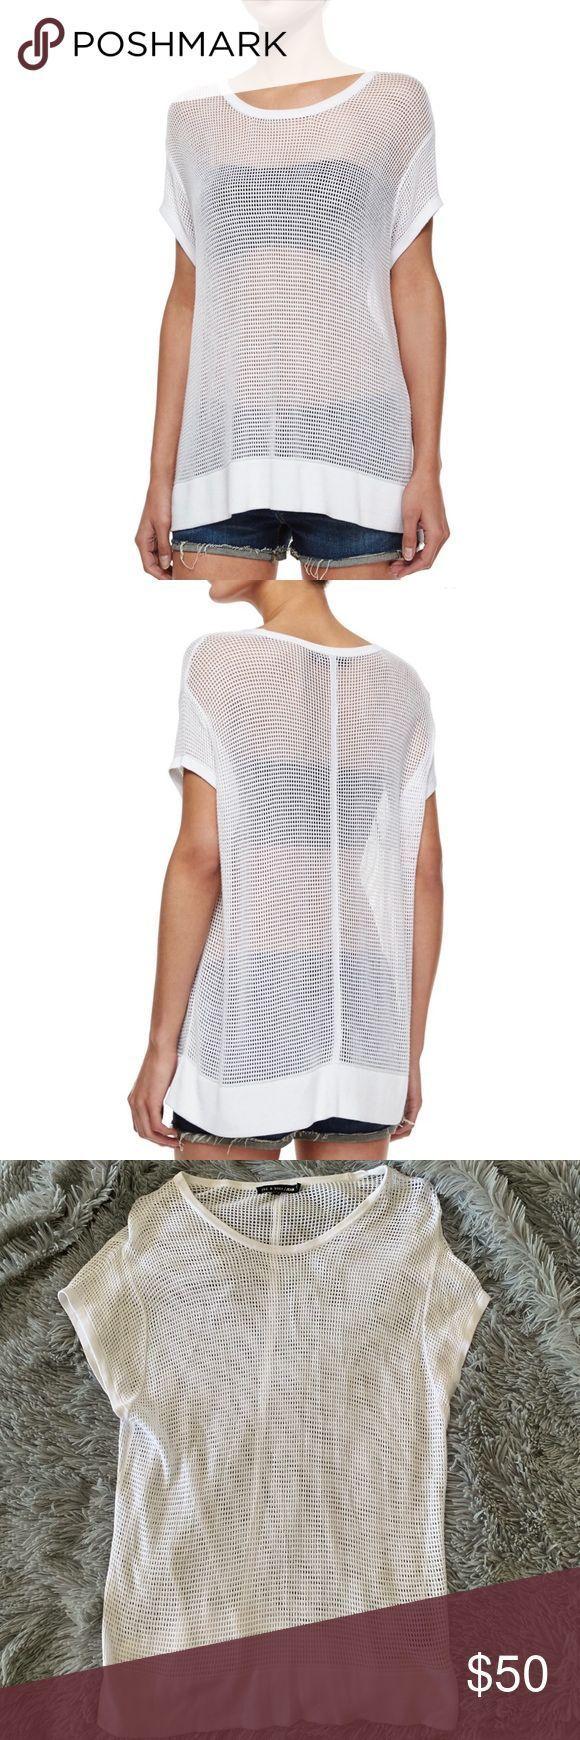 "RAG & BONE odette mesh tee ""Odette"" sheer short sleeved tee in mesh knit by rag …"